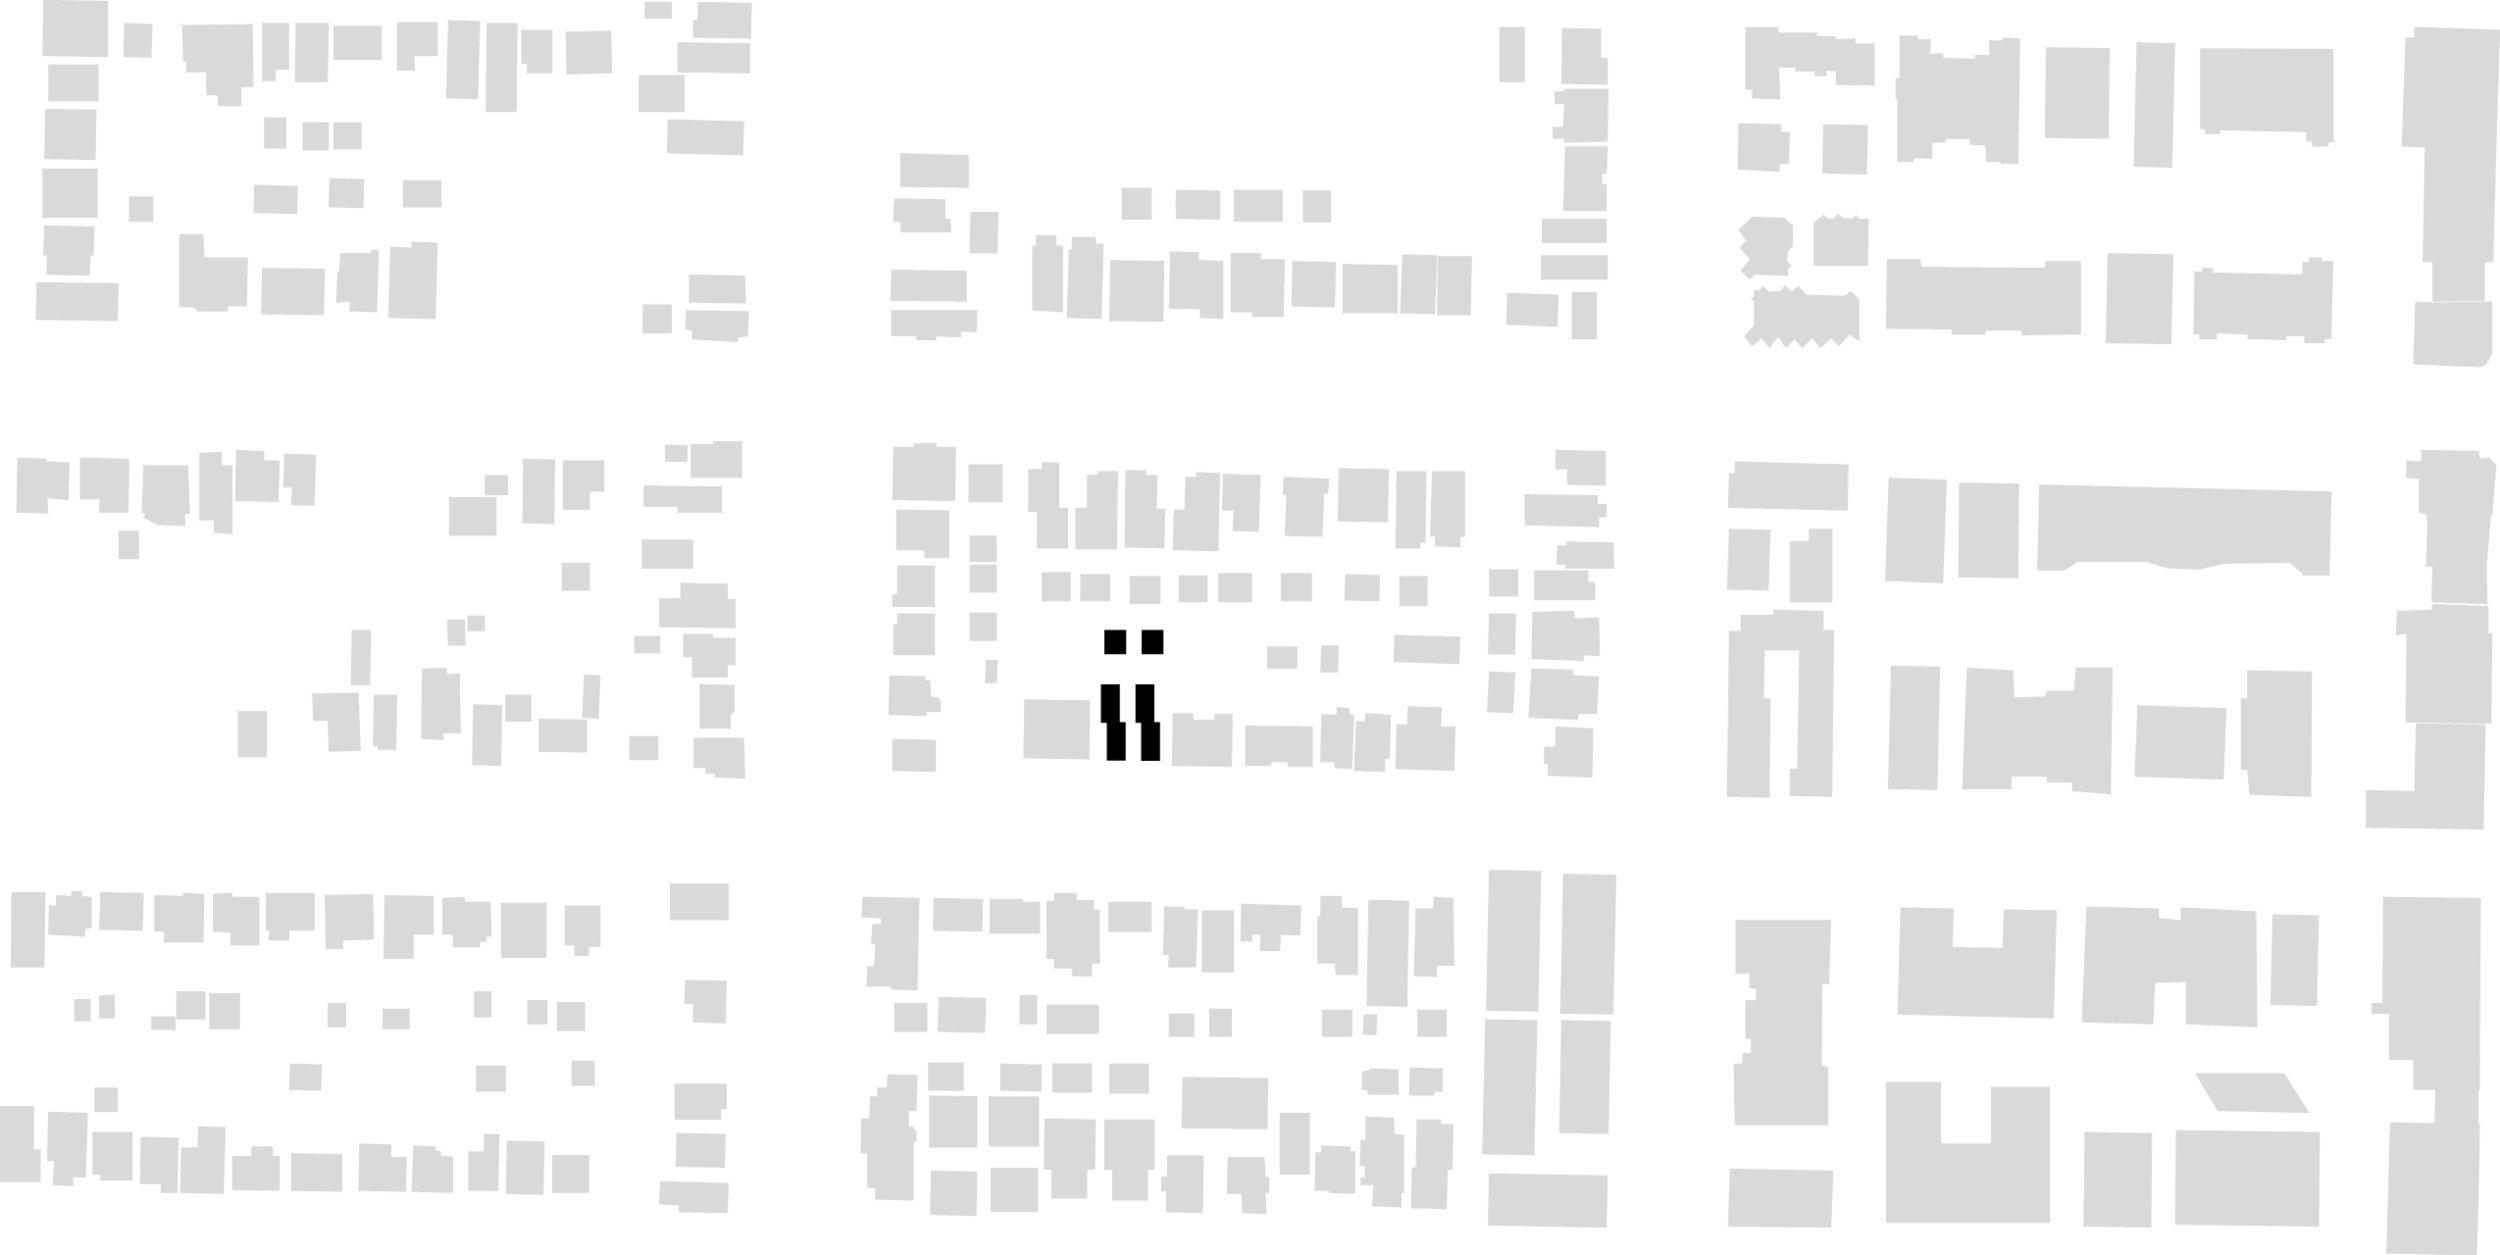 49 - SCHWARZPLAN.jpg